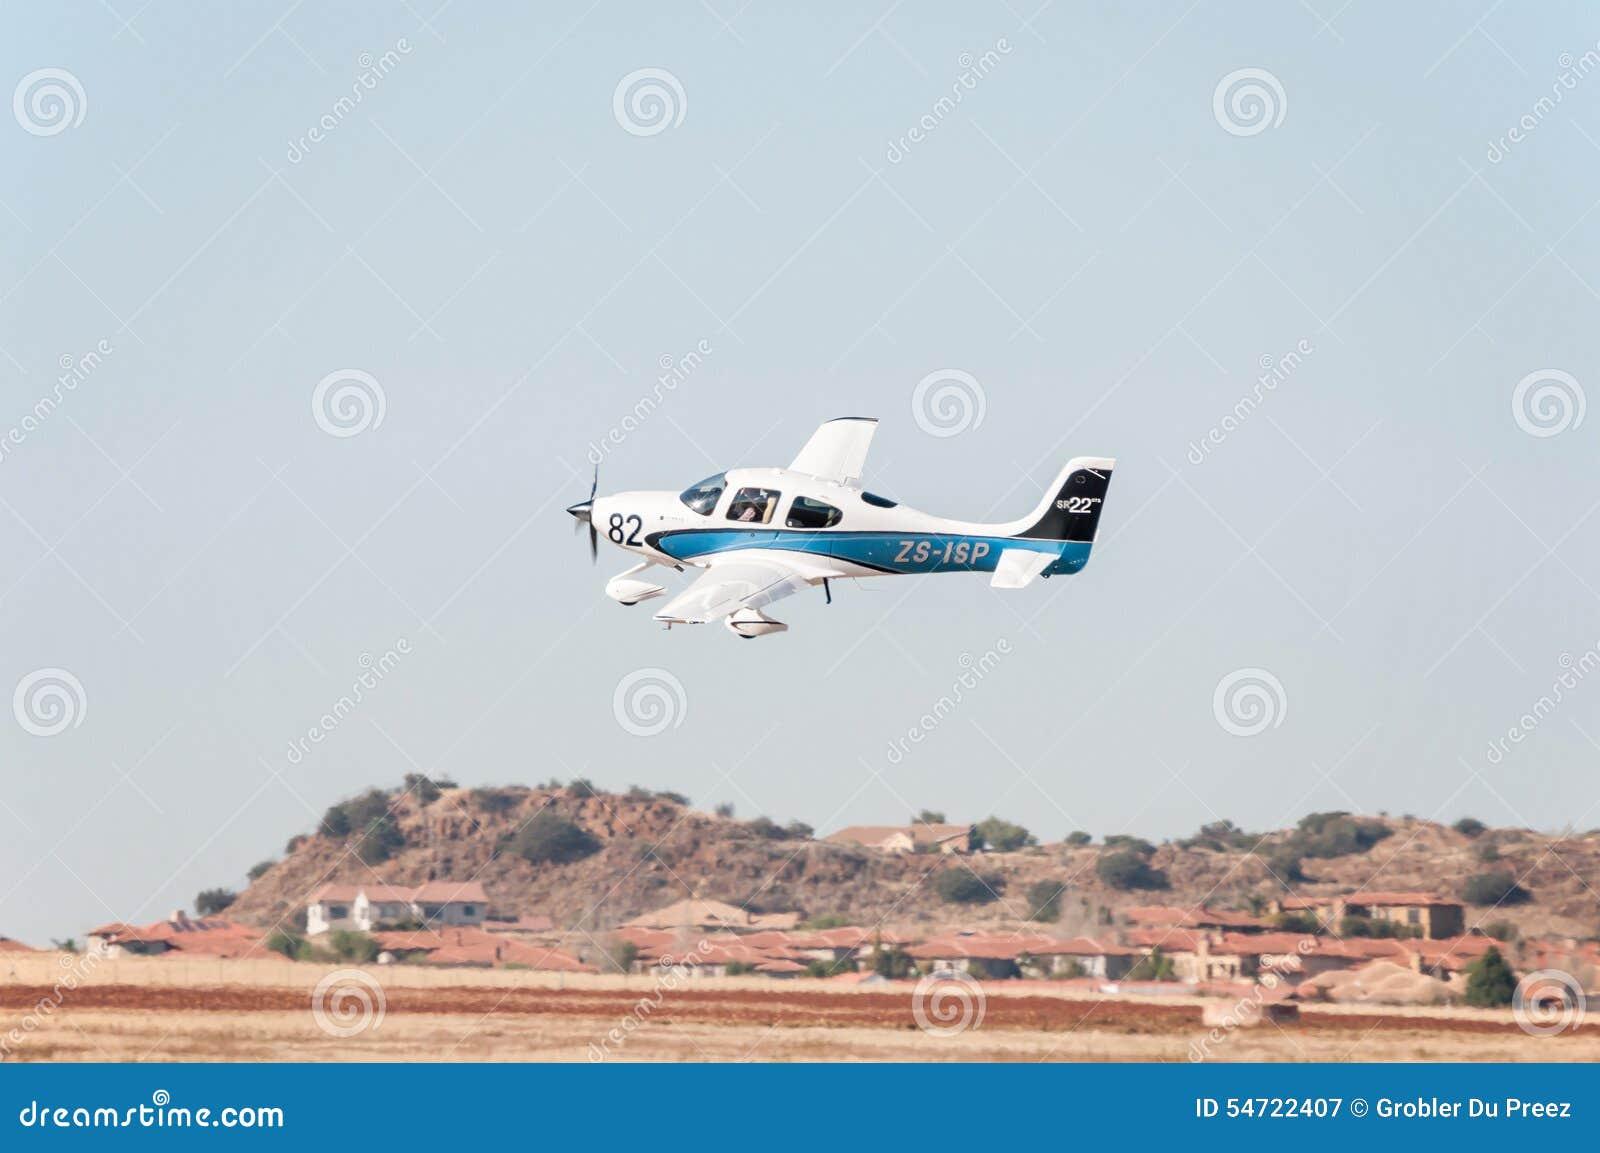 Beechcraft A36 stijgt in Presidenten Trophy Air Race op